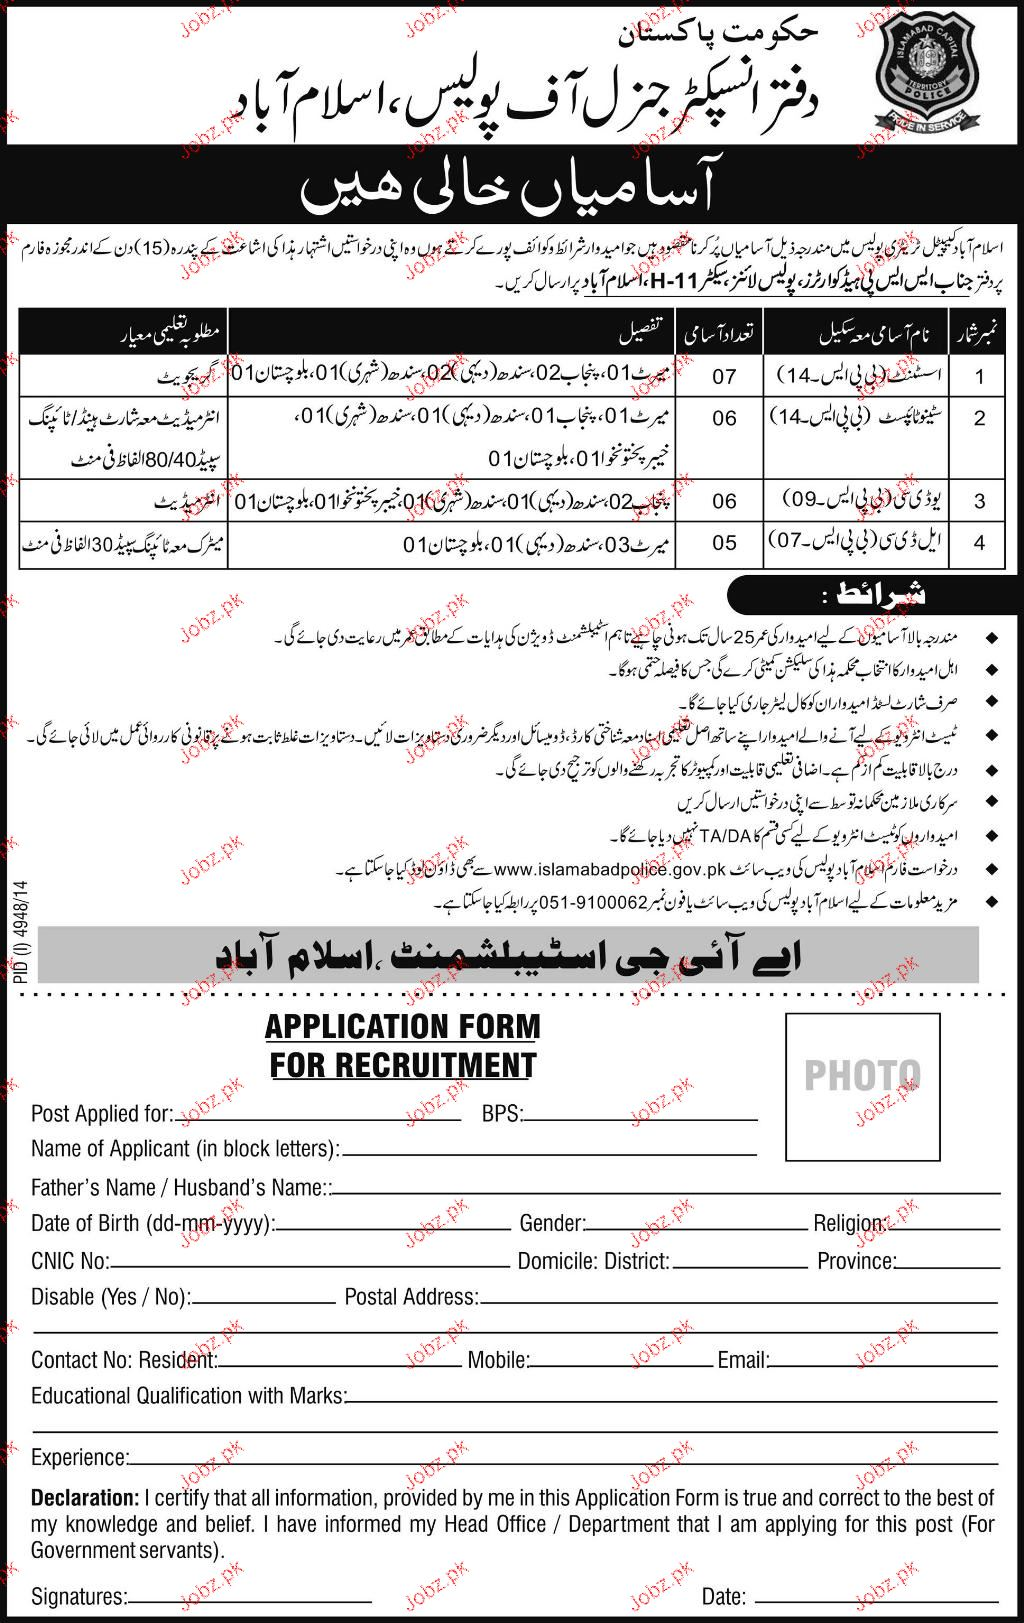 Assistants, Stenotypist, UDC Job in Islamabad Police